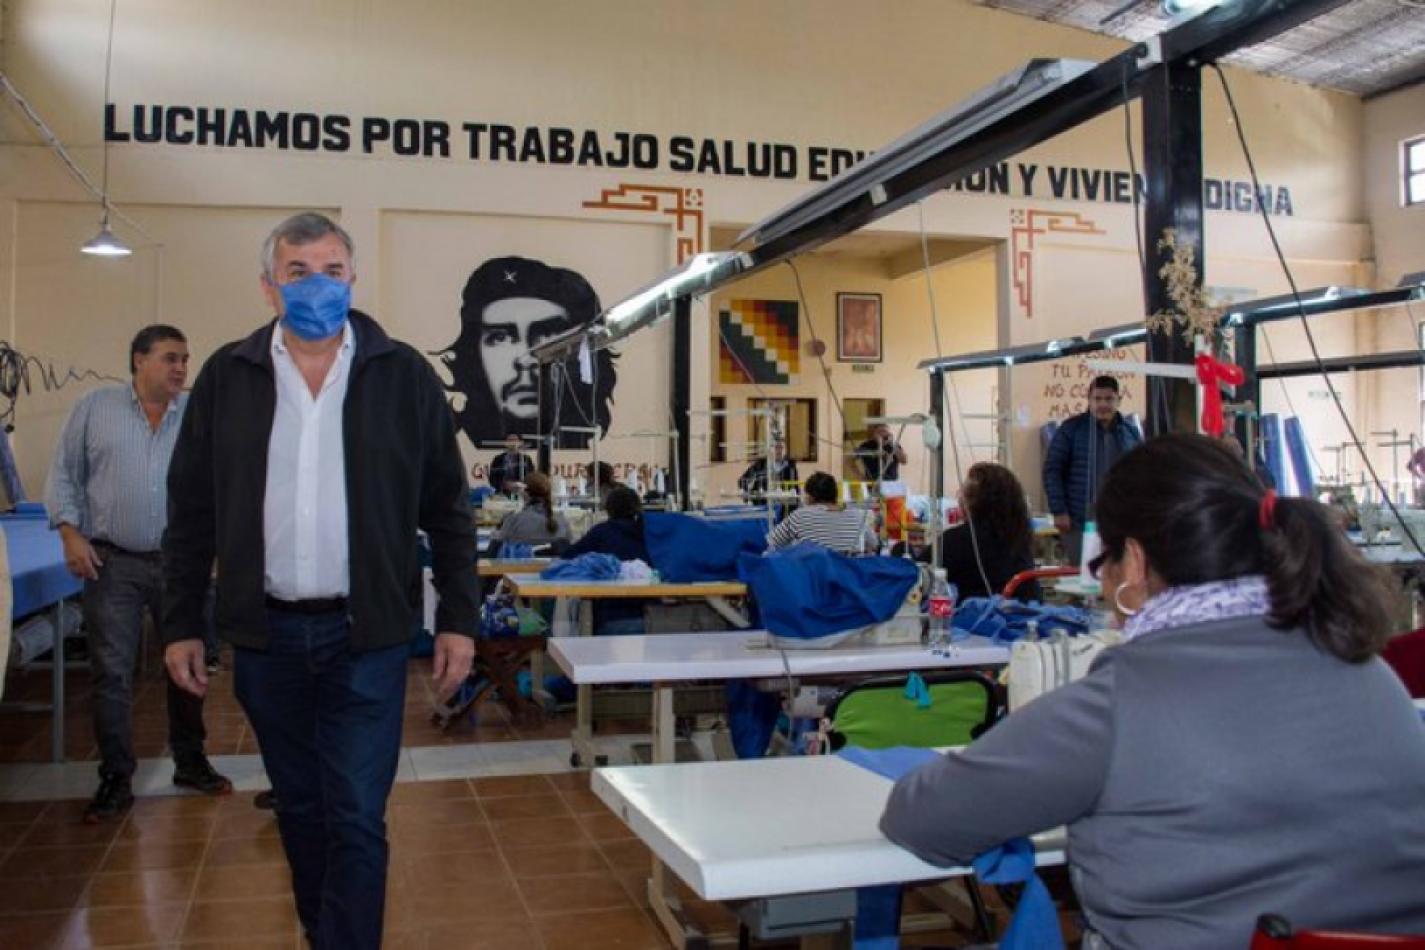 Foto: Twitter Gerardo Morales en la visita a la textil de la Tupac Amaru